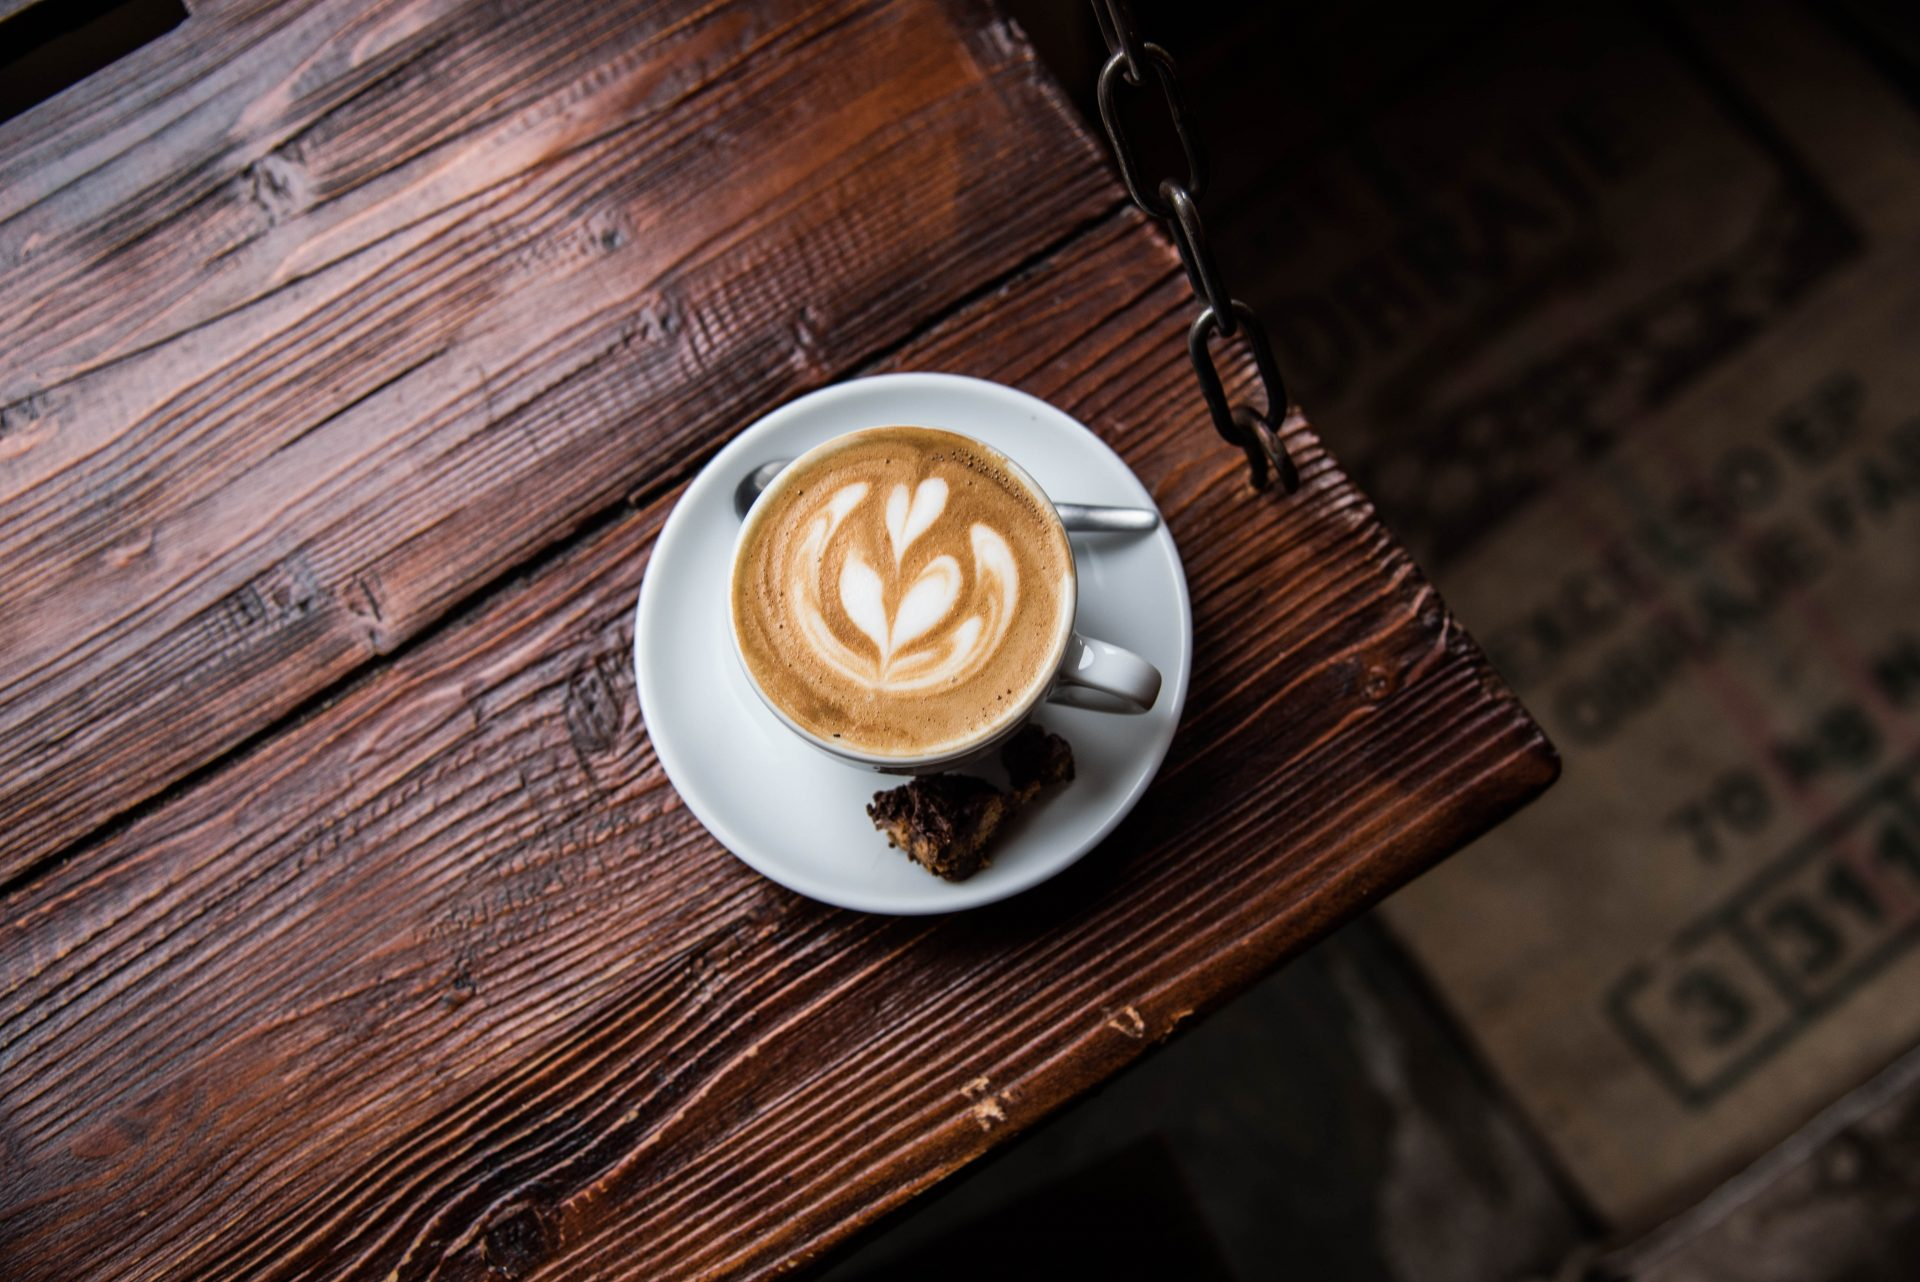 Drab Coffee Beans & Machines in 's-Hertogenbosch